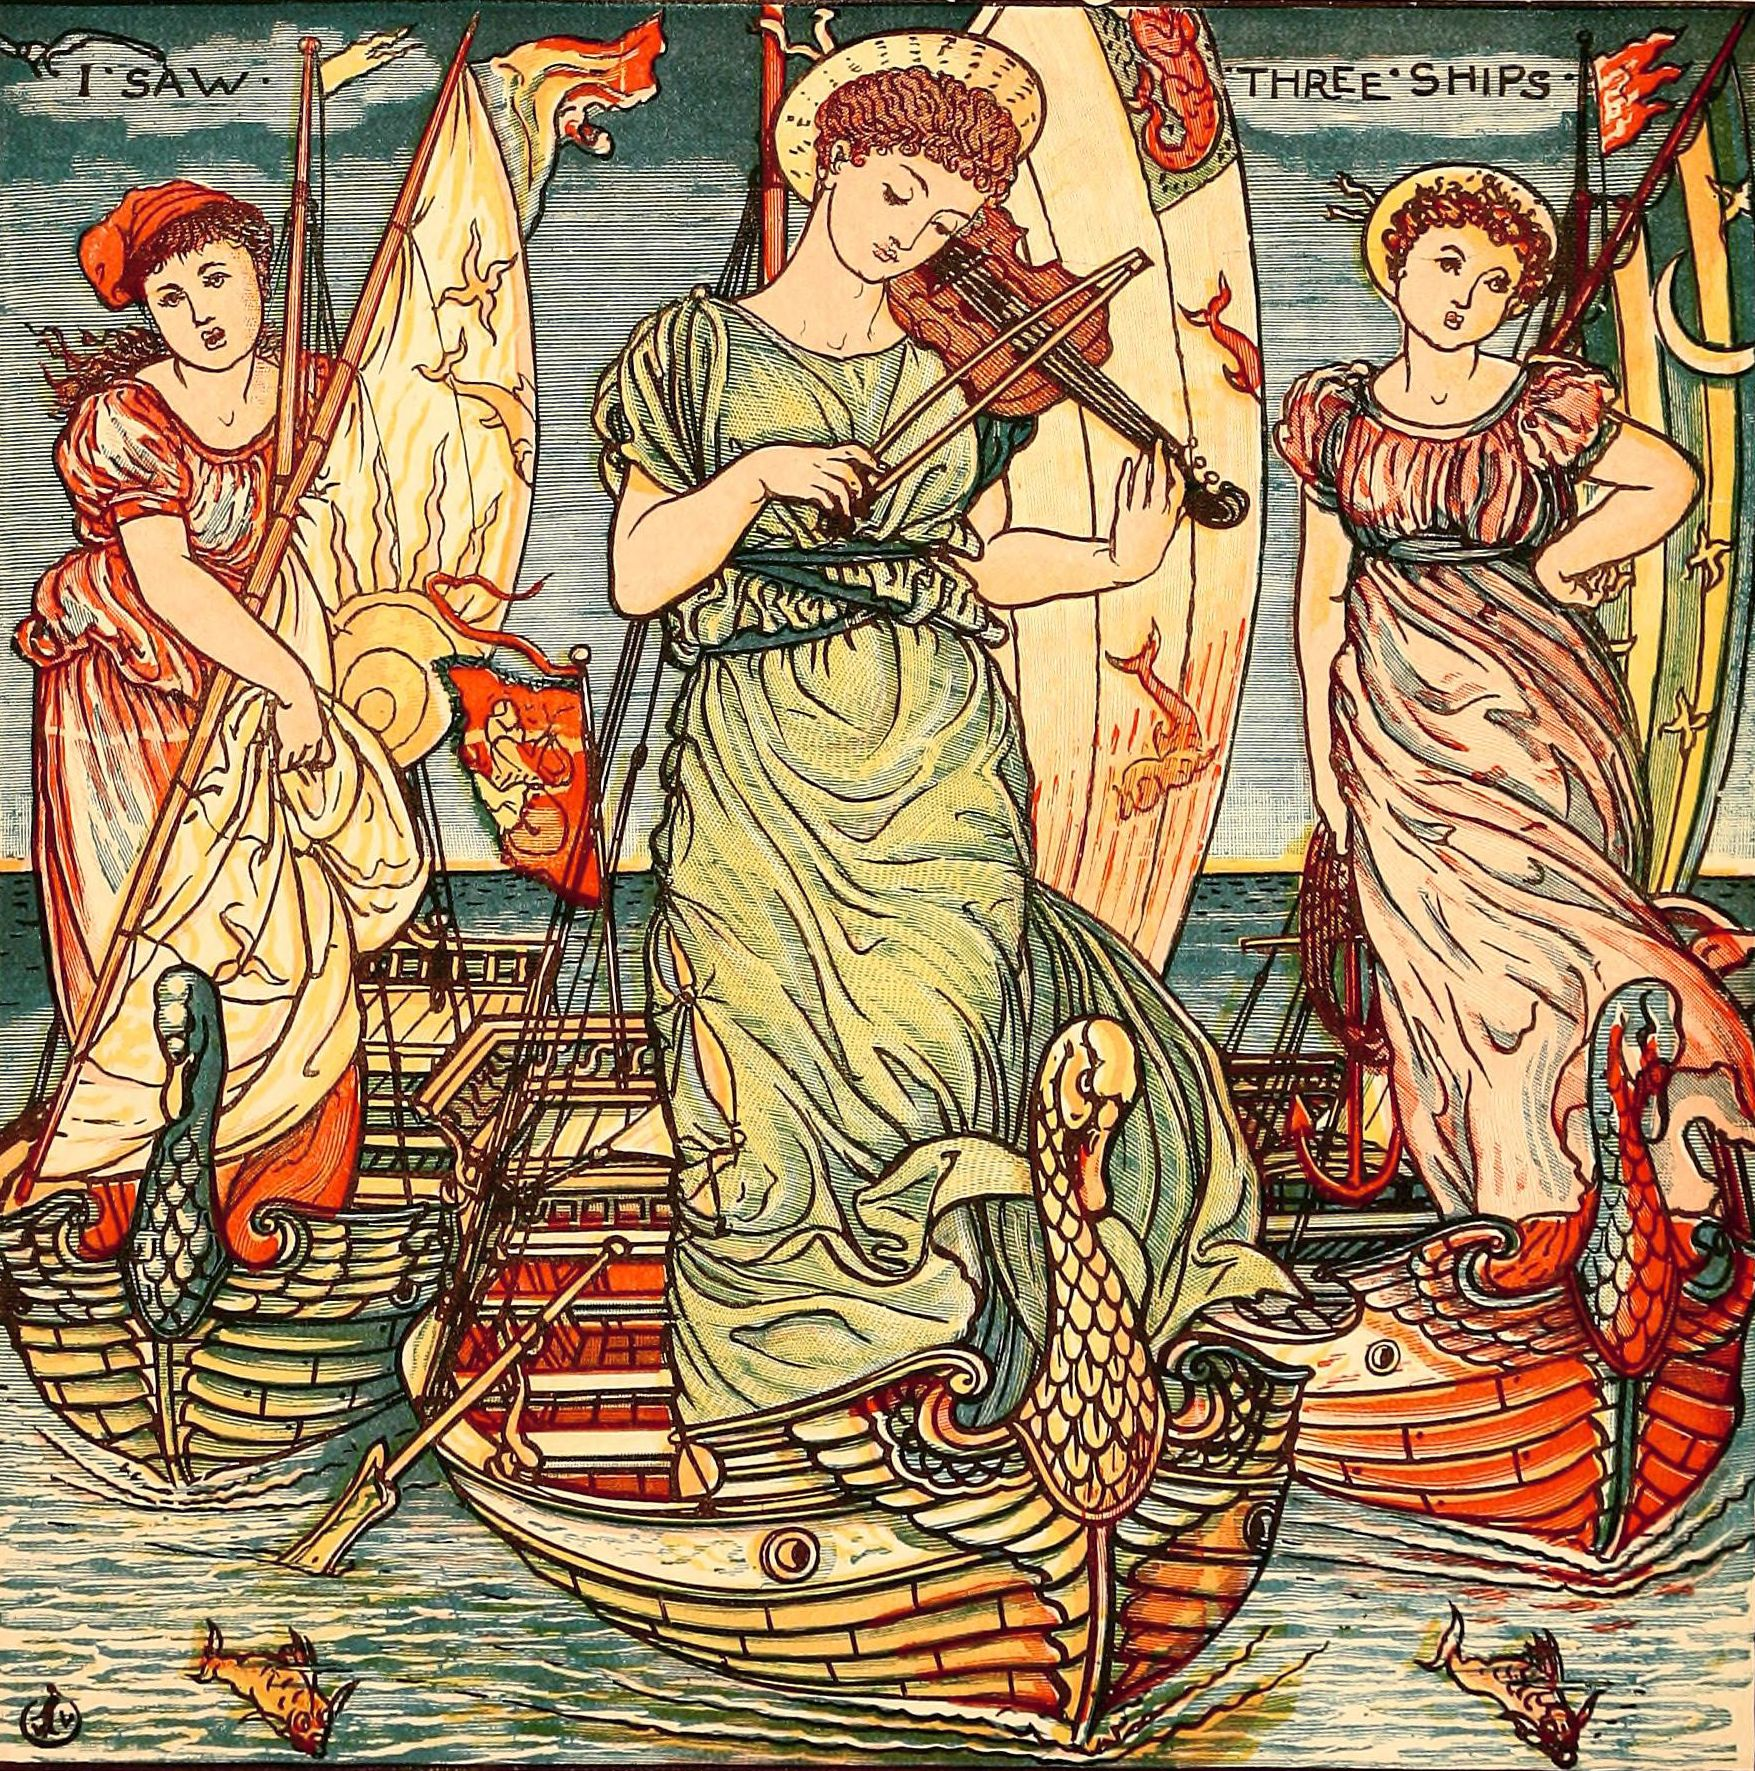 i-saw-three-ships-color-illustration-by-walter-crane-circa-1889     children's book   Pinterest ...